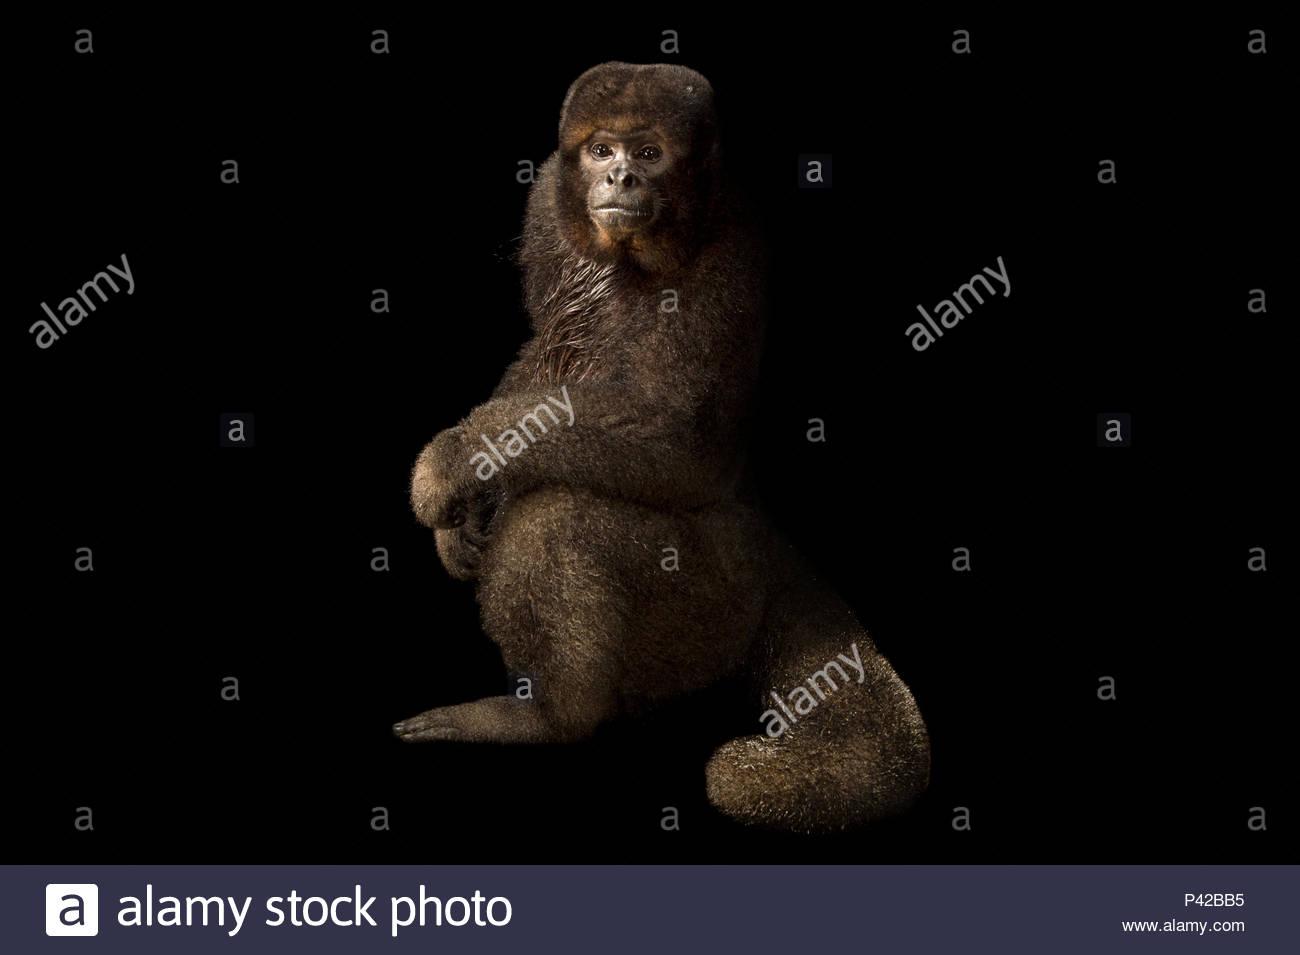 A brown woolly monkey, Lagothrix lagothrica lagothrica, at Piscilago Zoo. Stock Photo